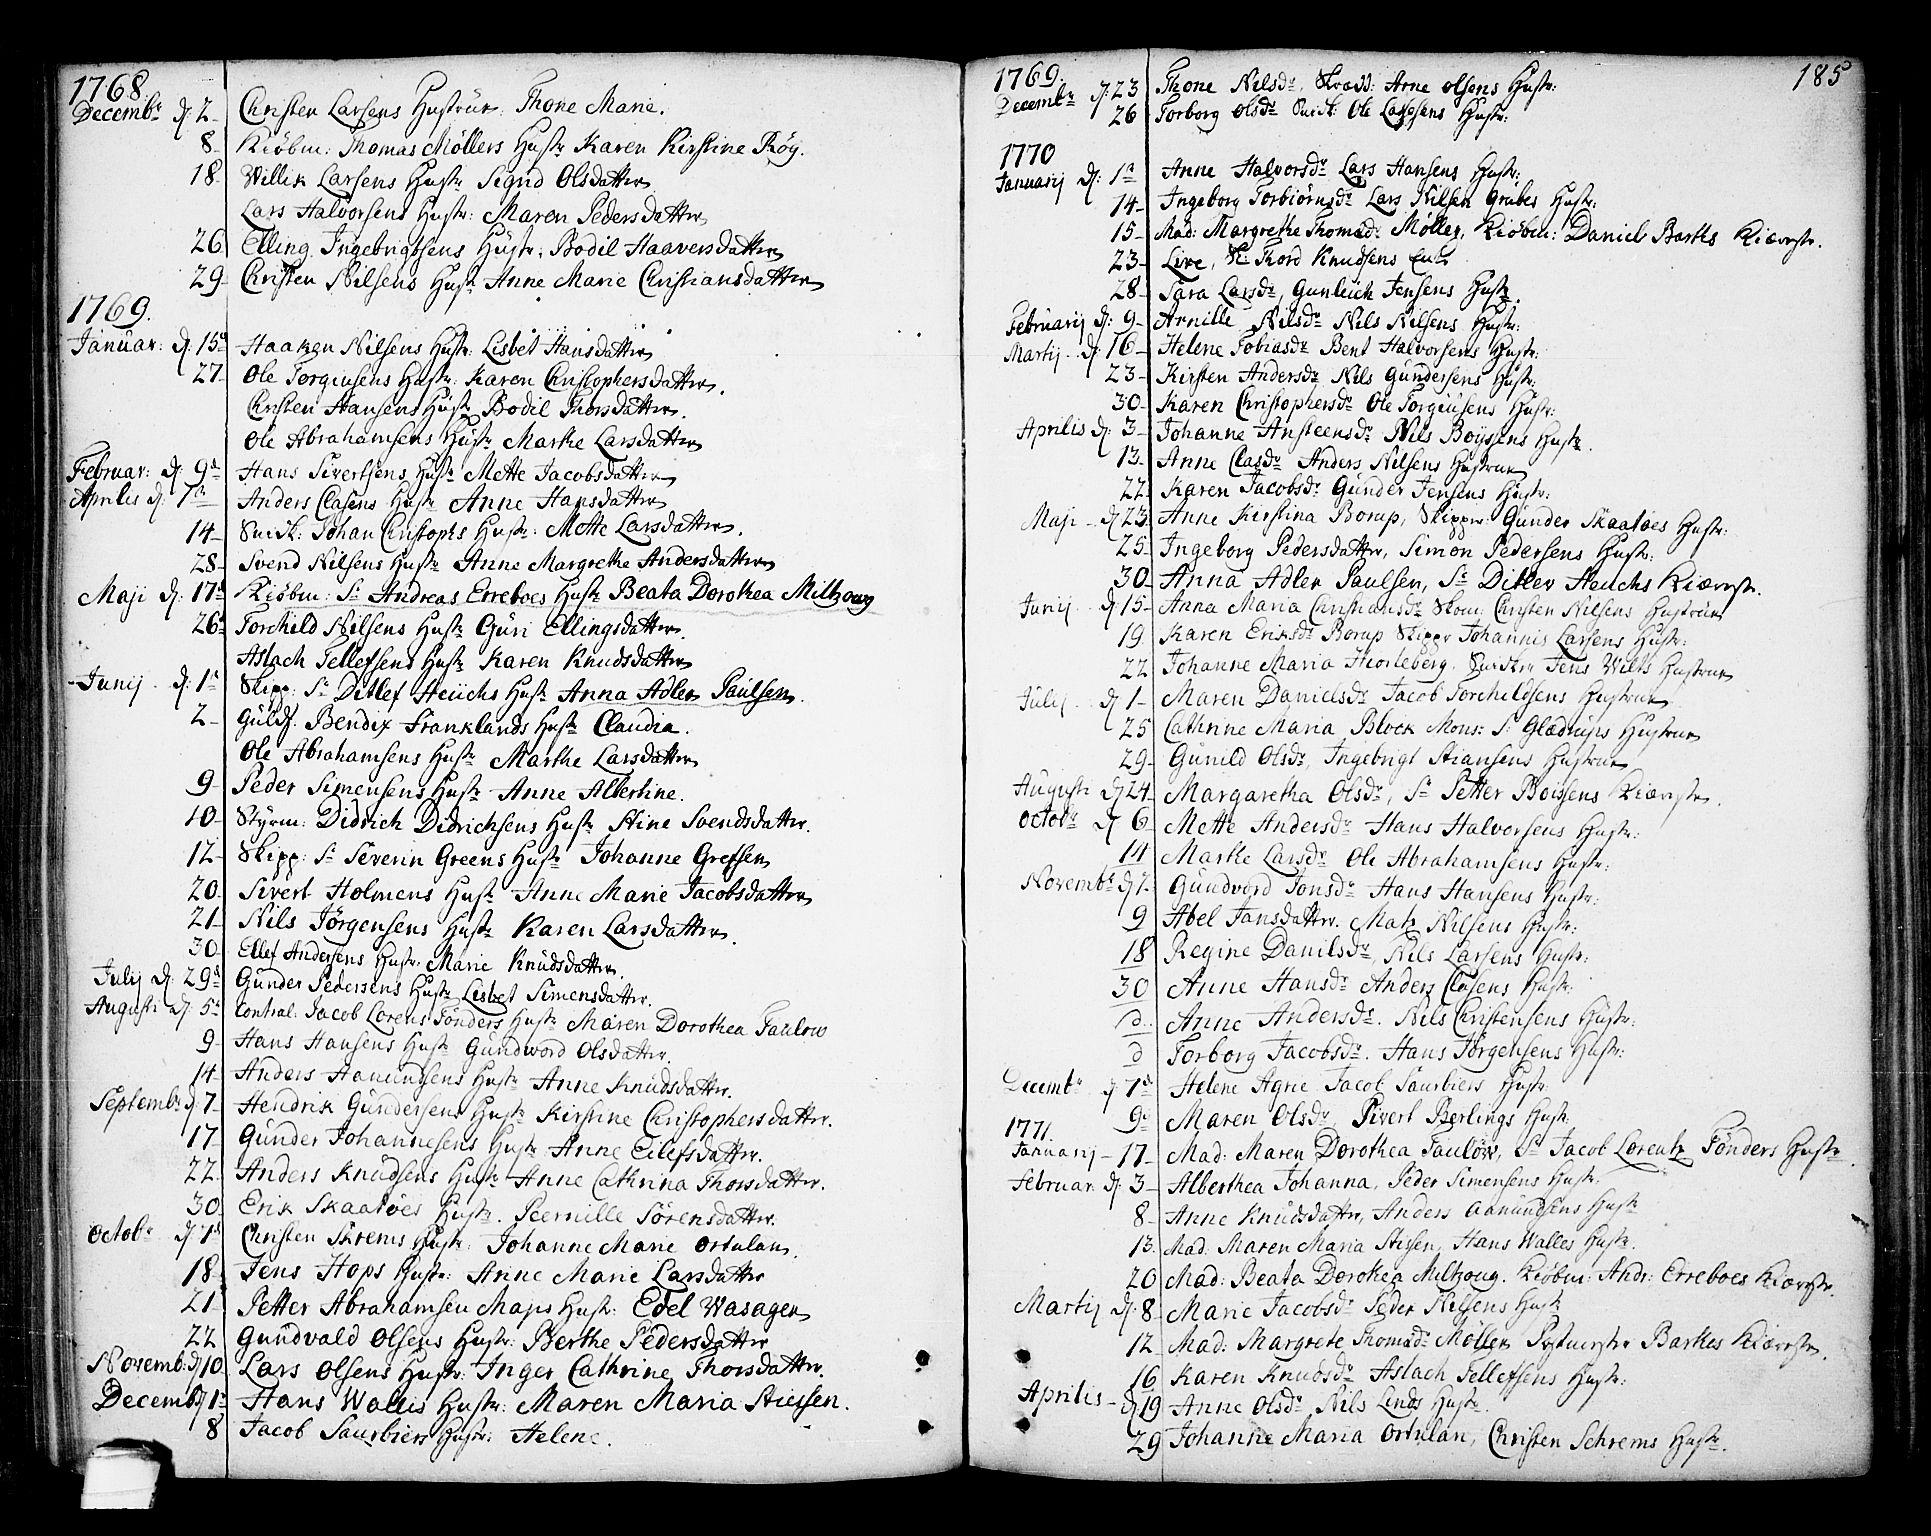 SAKO, Kragerø kirkebøker, F/Fa/L0002: Ministerialbok nr. 2, 1767-1802, s. 185